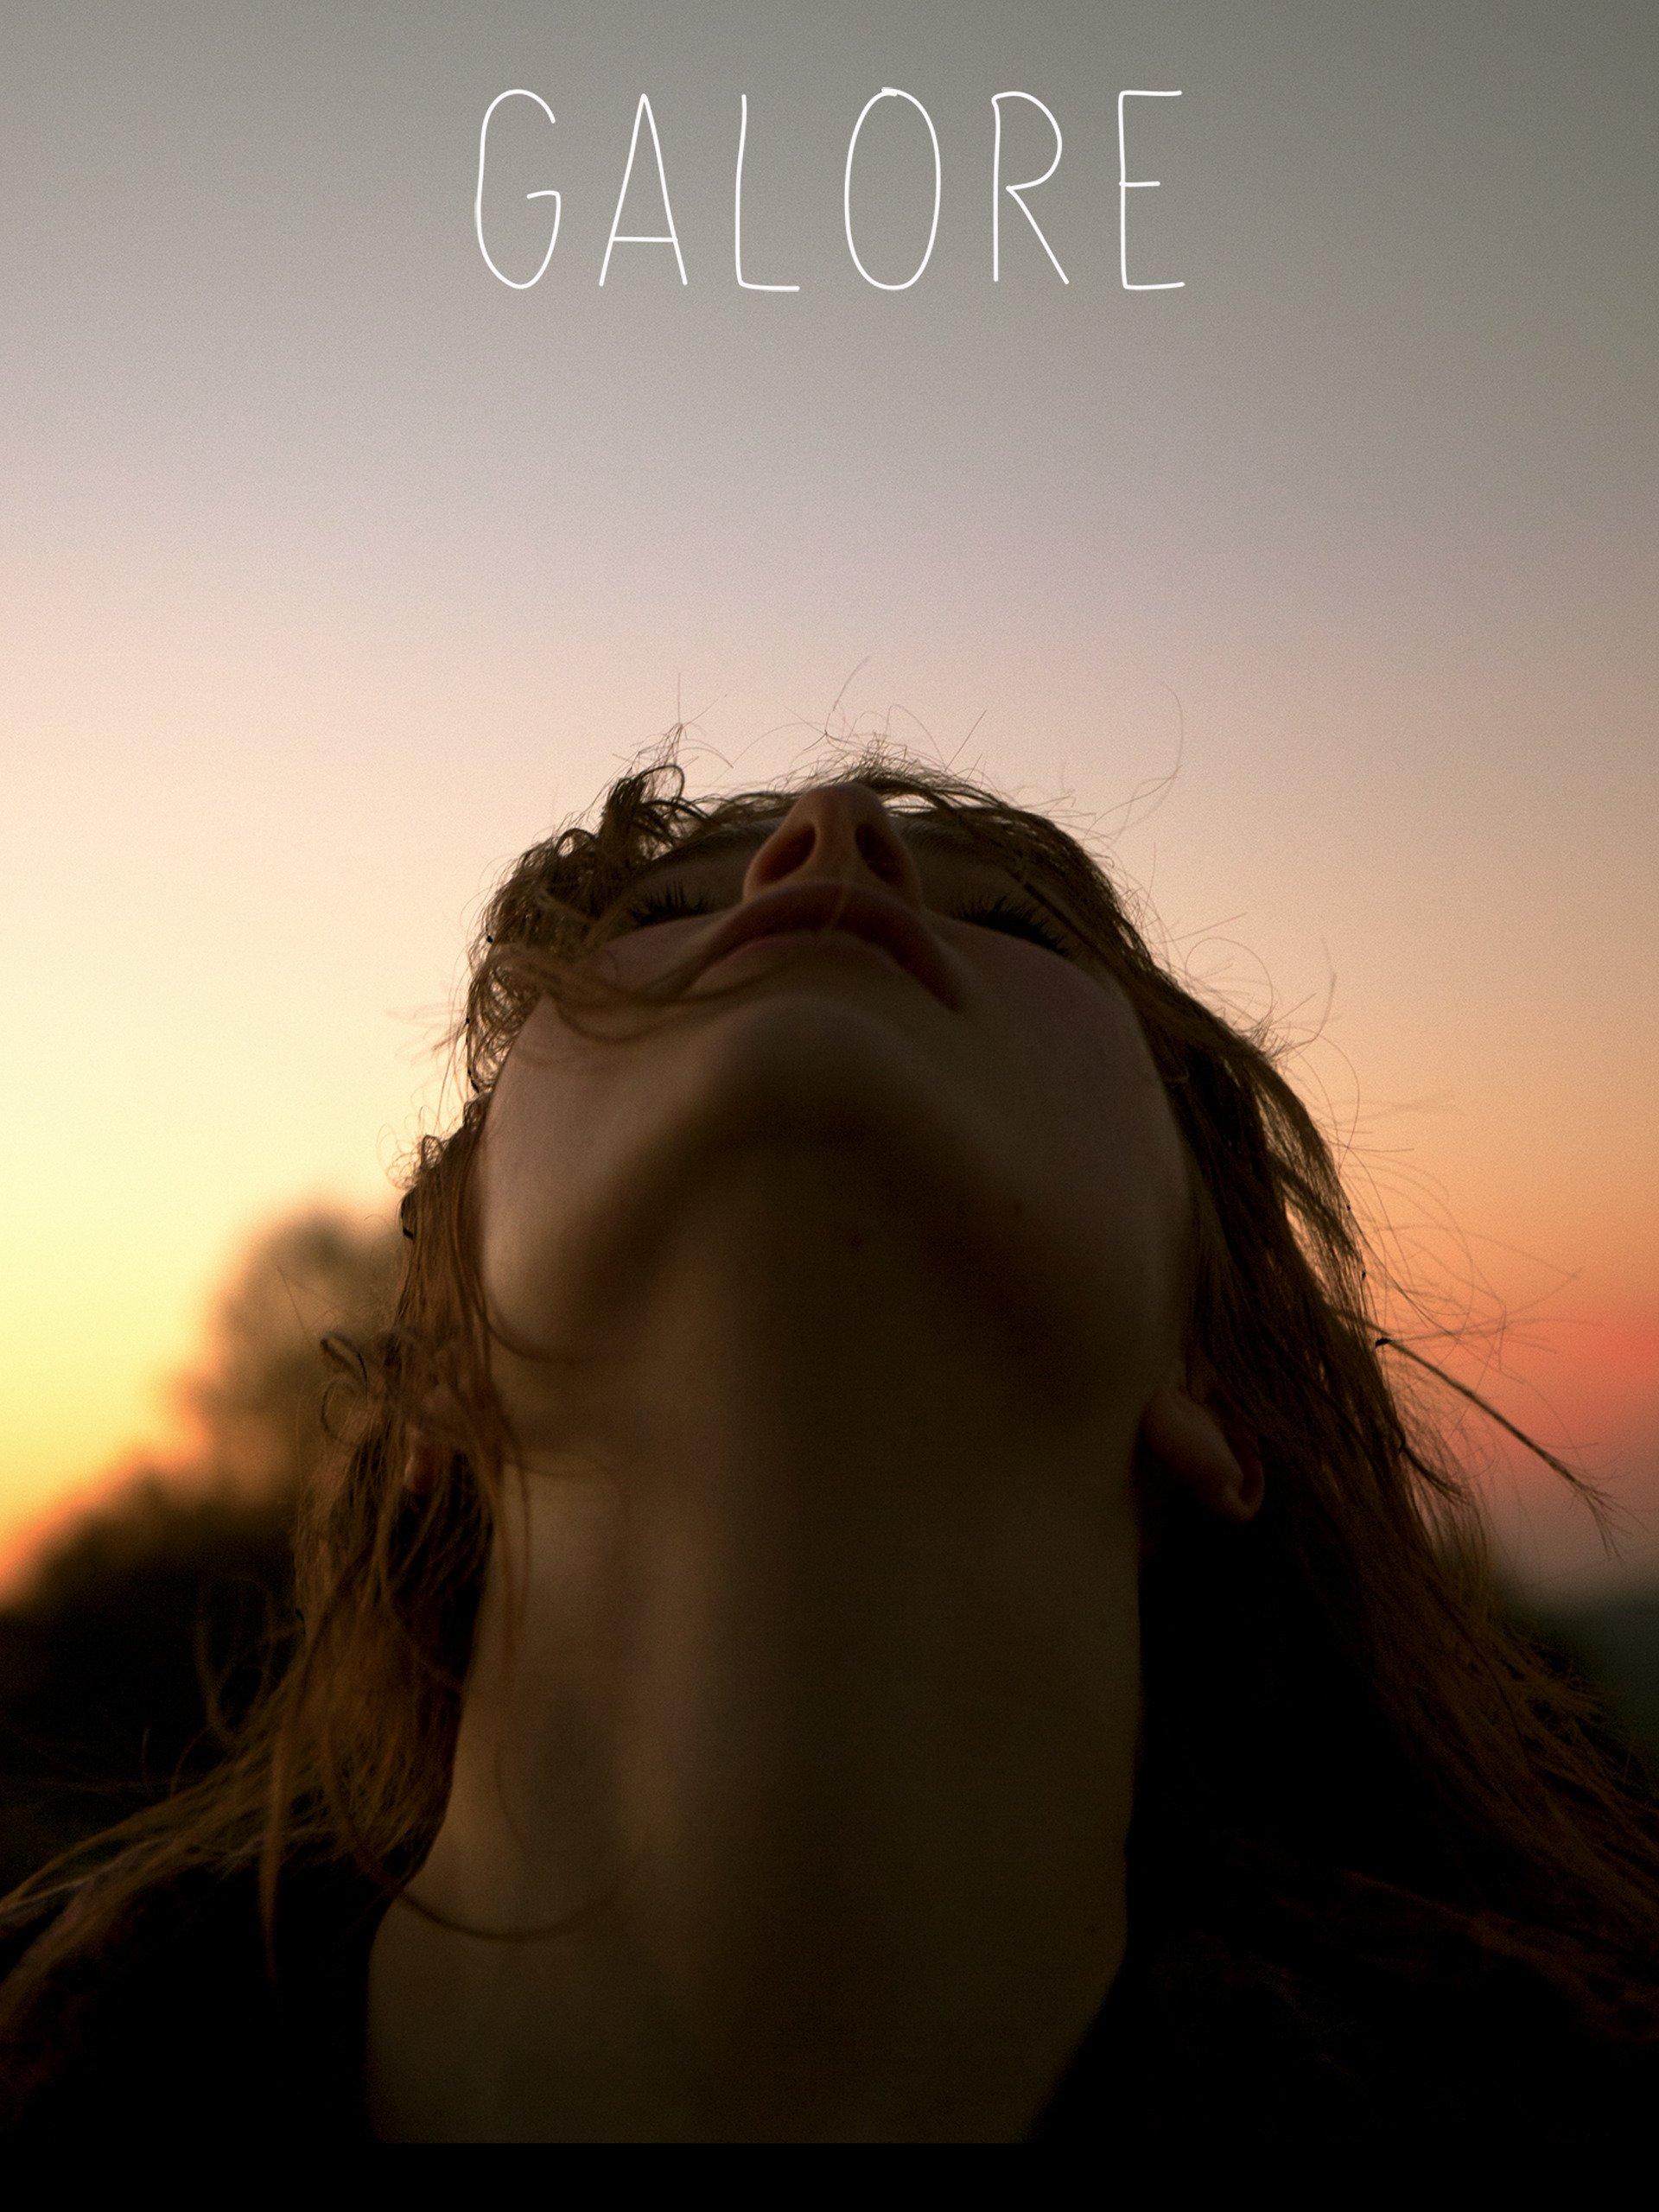 Amazon.com: Galore: Ashleigh Cummings, Aliki Matangi, Lily Sullivan ...